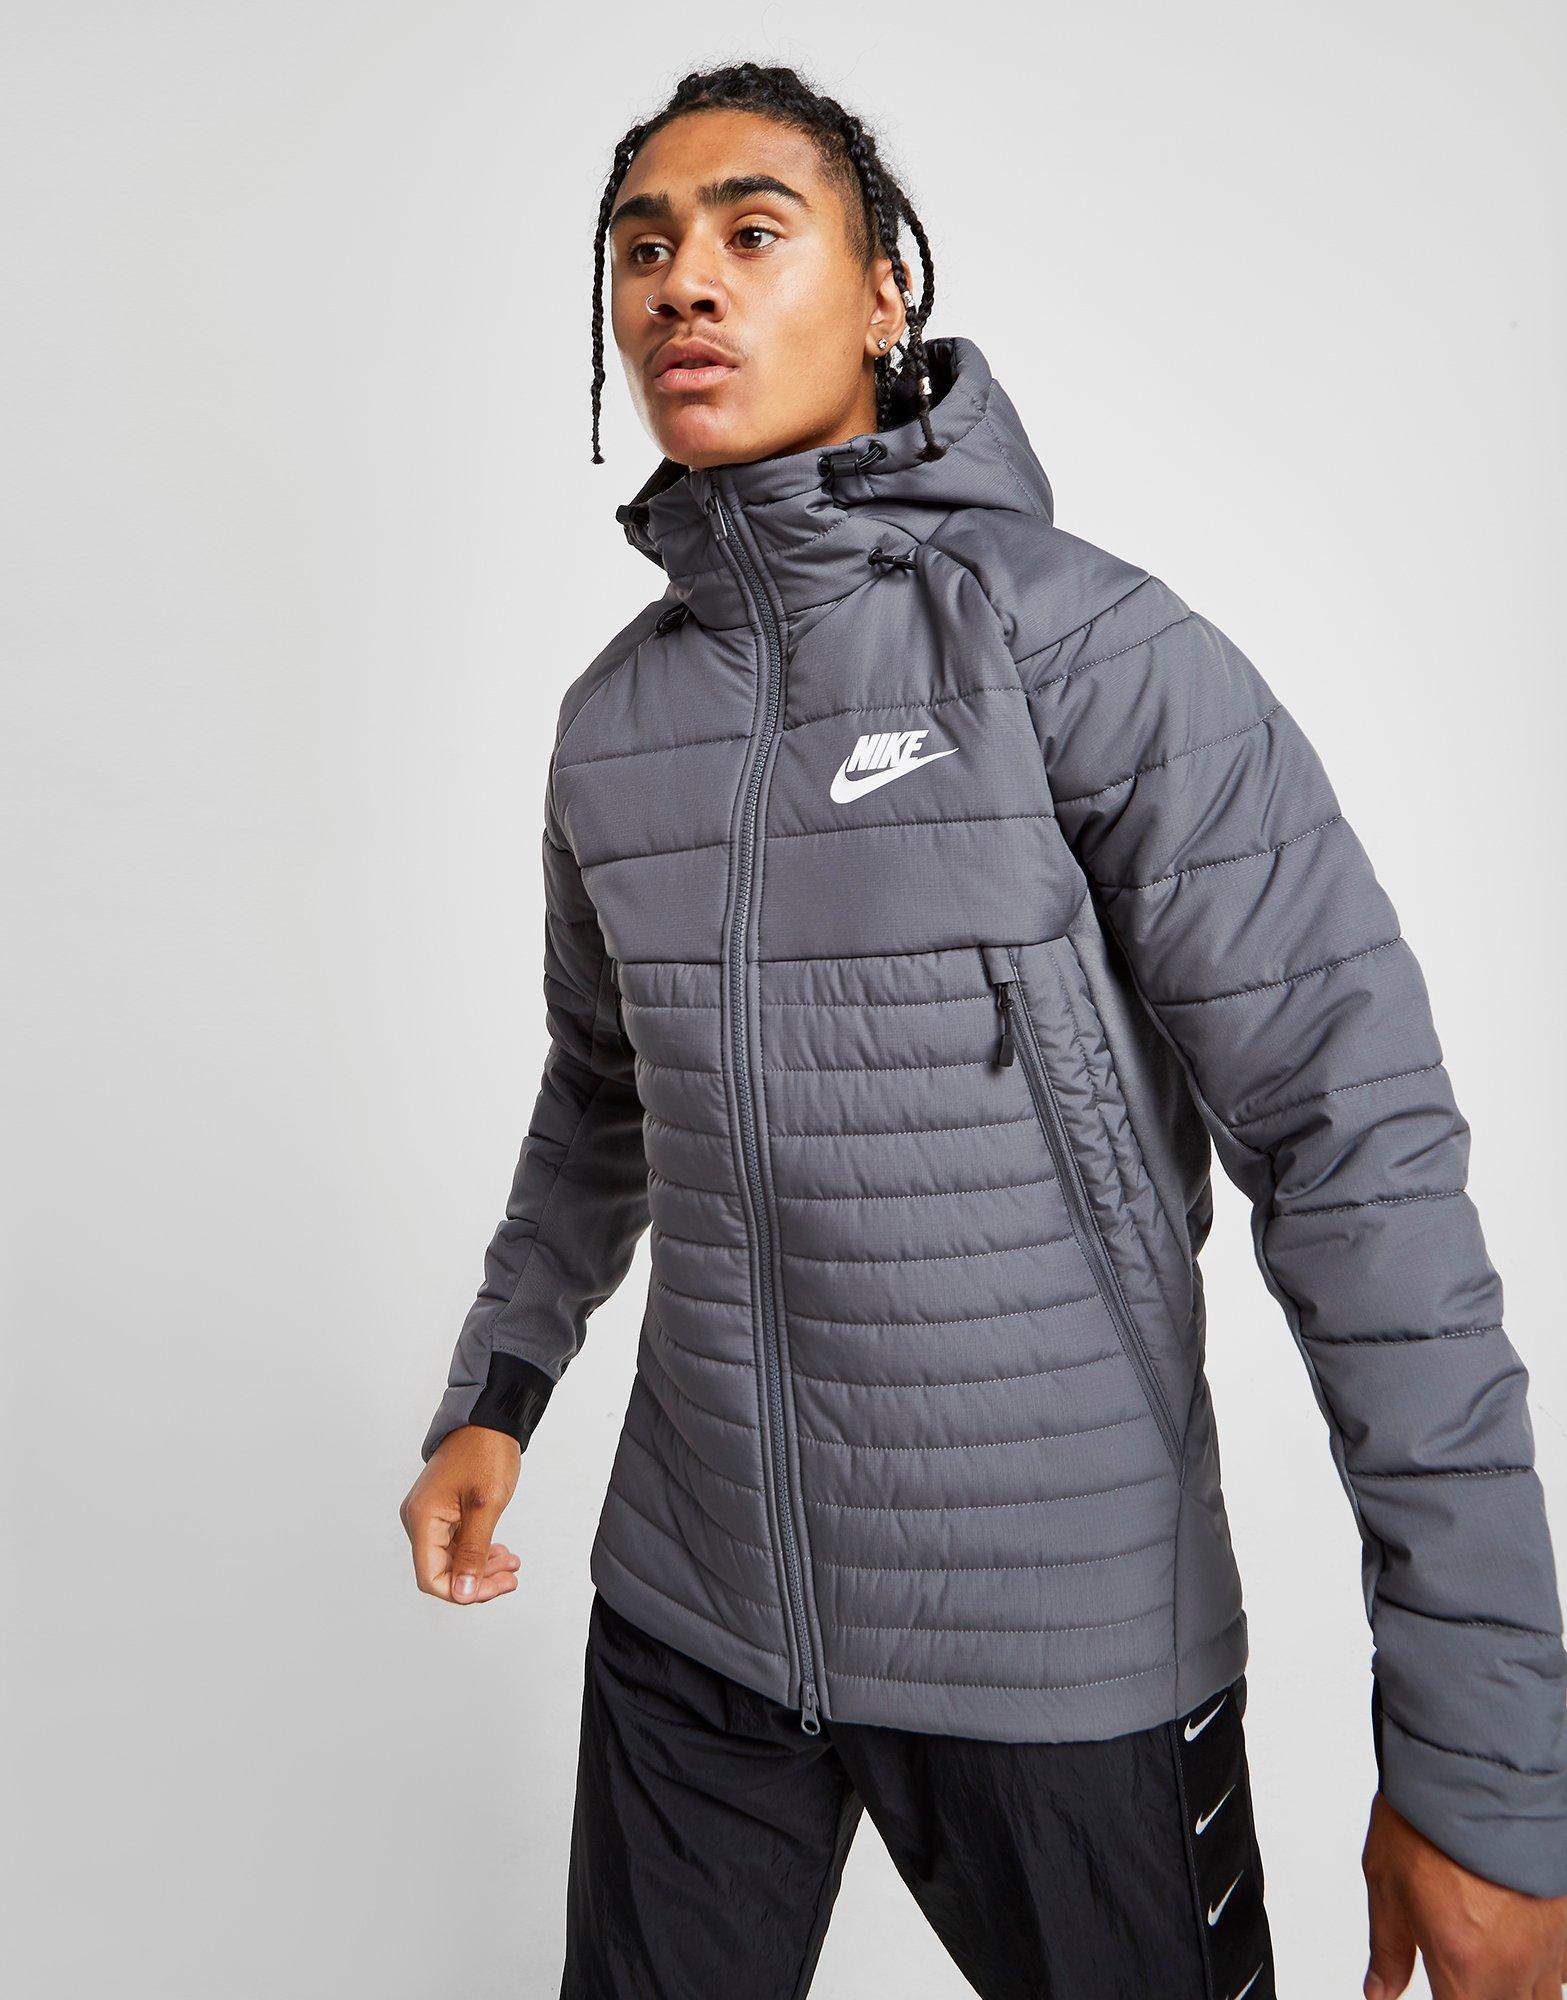 nike jacket gray